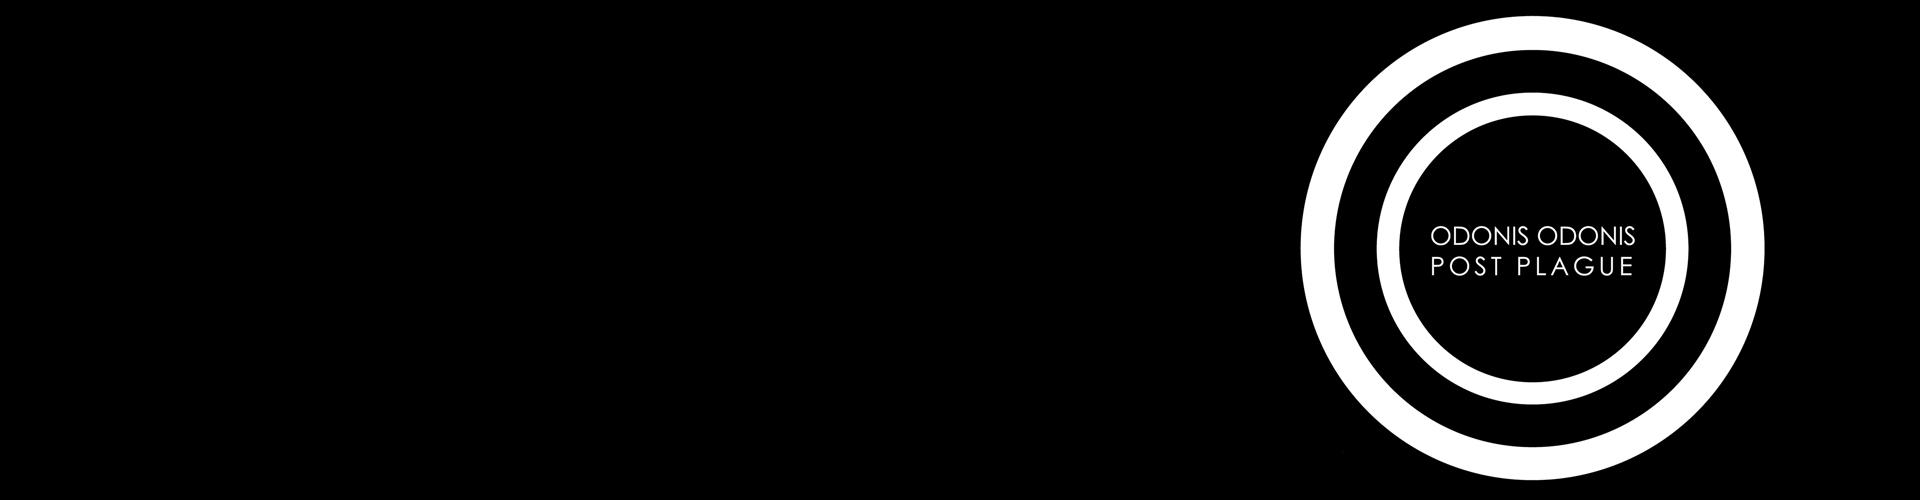 Odonis-Odonis3